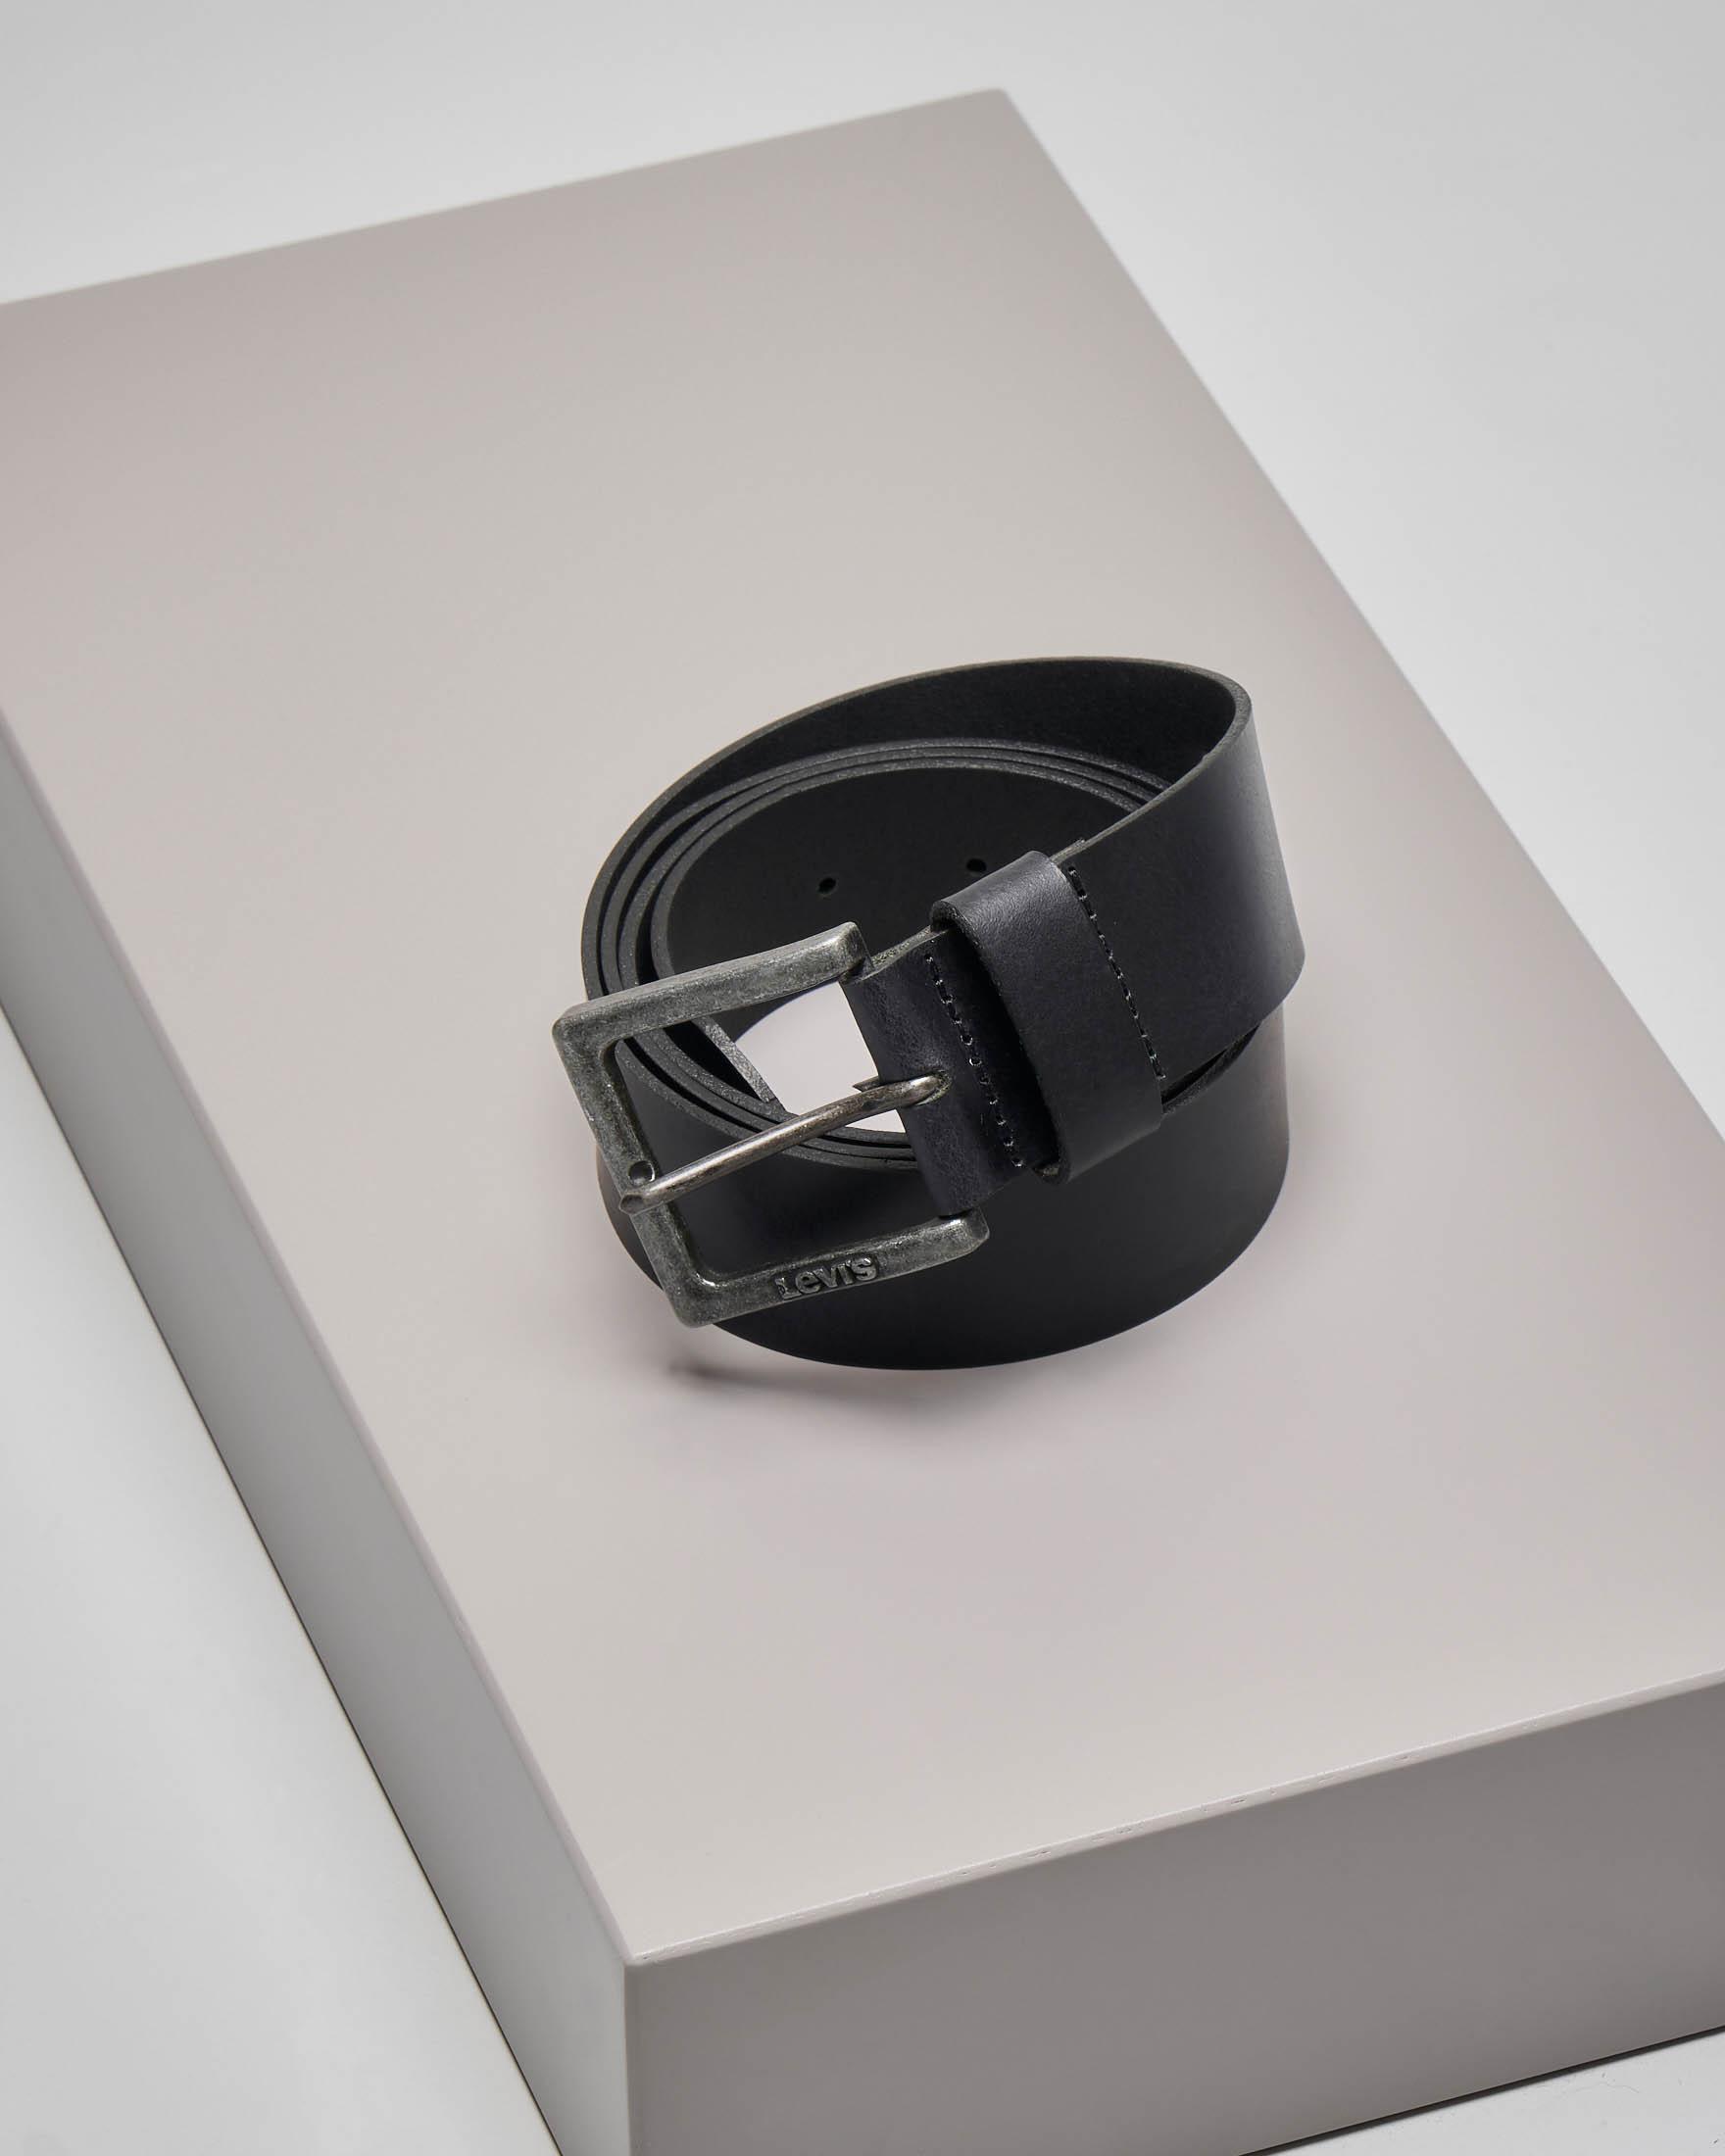 Cintura nera in pelle con fibbia brunita effetto vintage